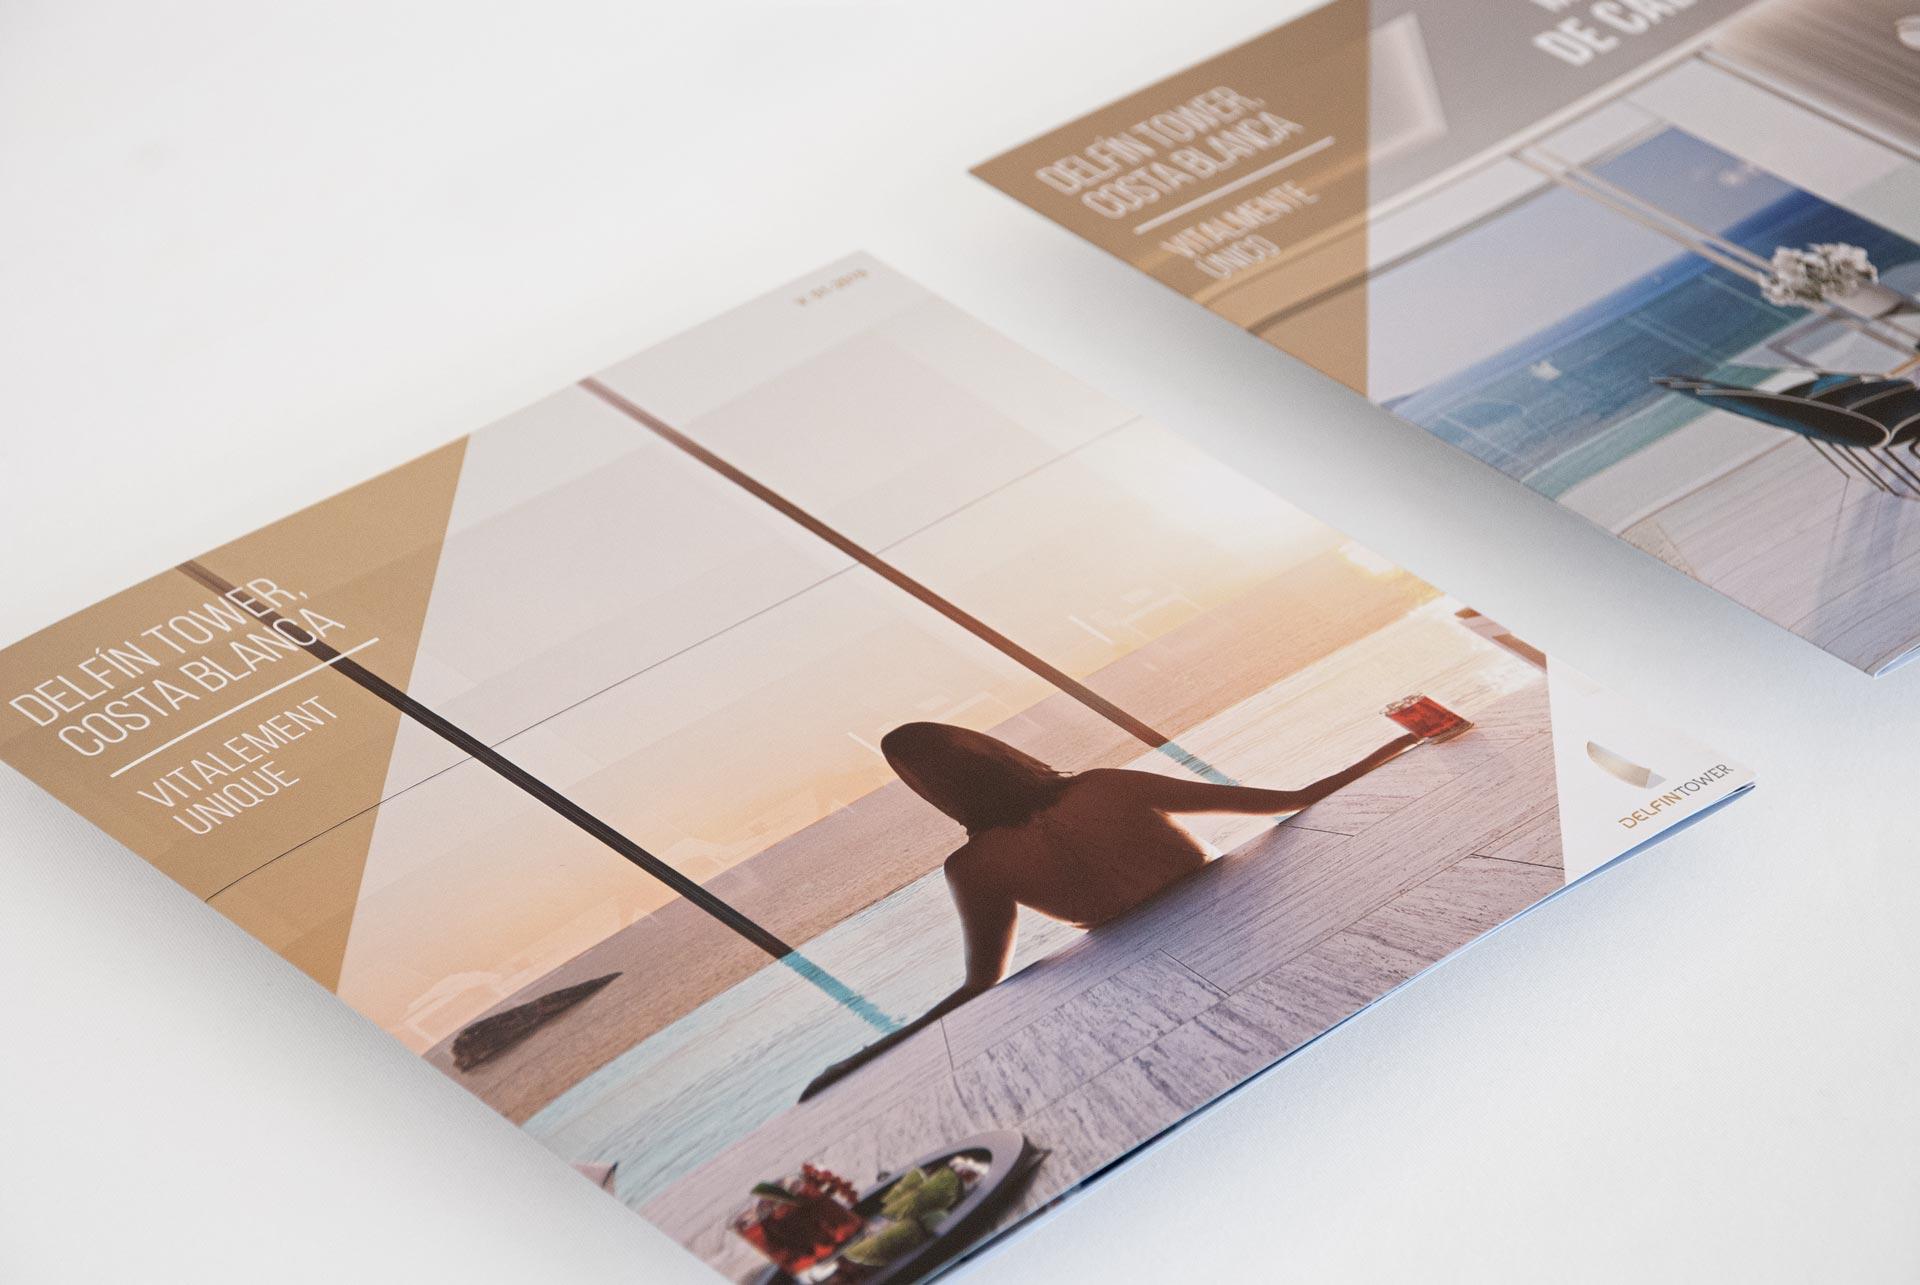 giset design delfin tower identidad corporativa flyer